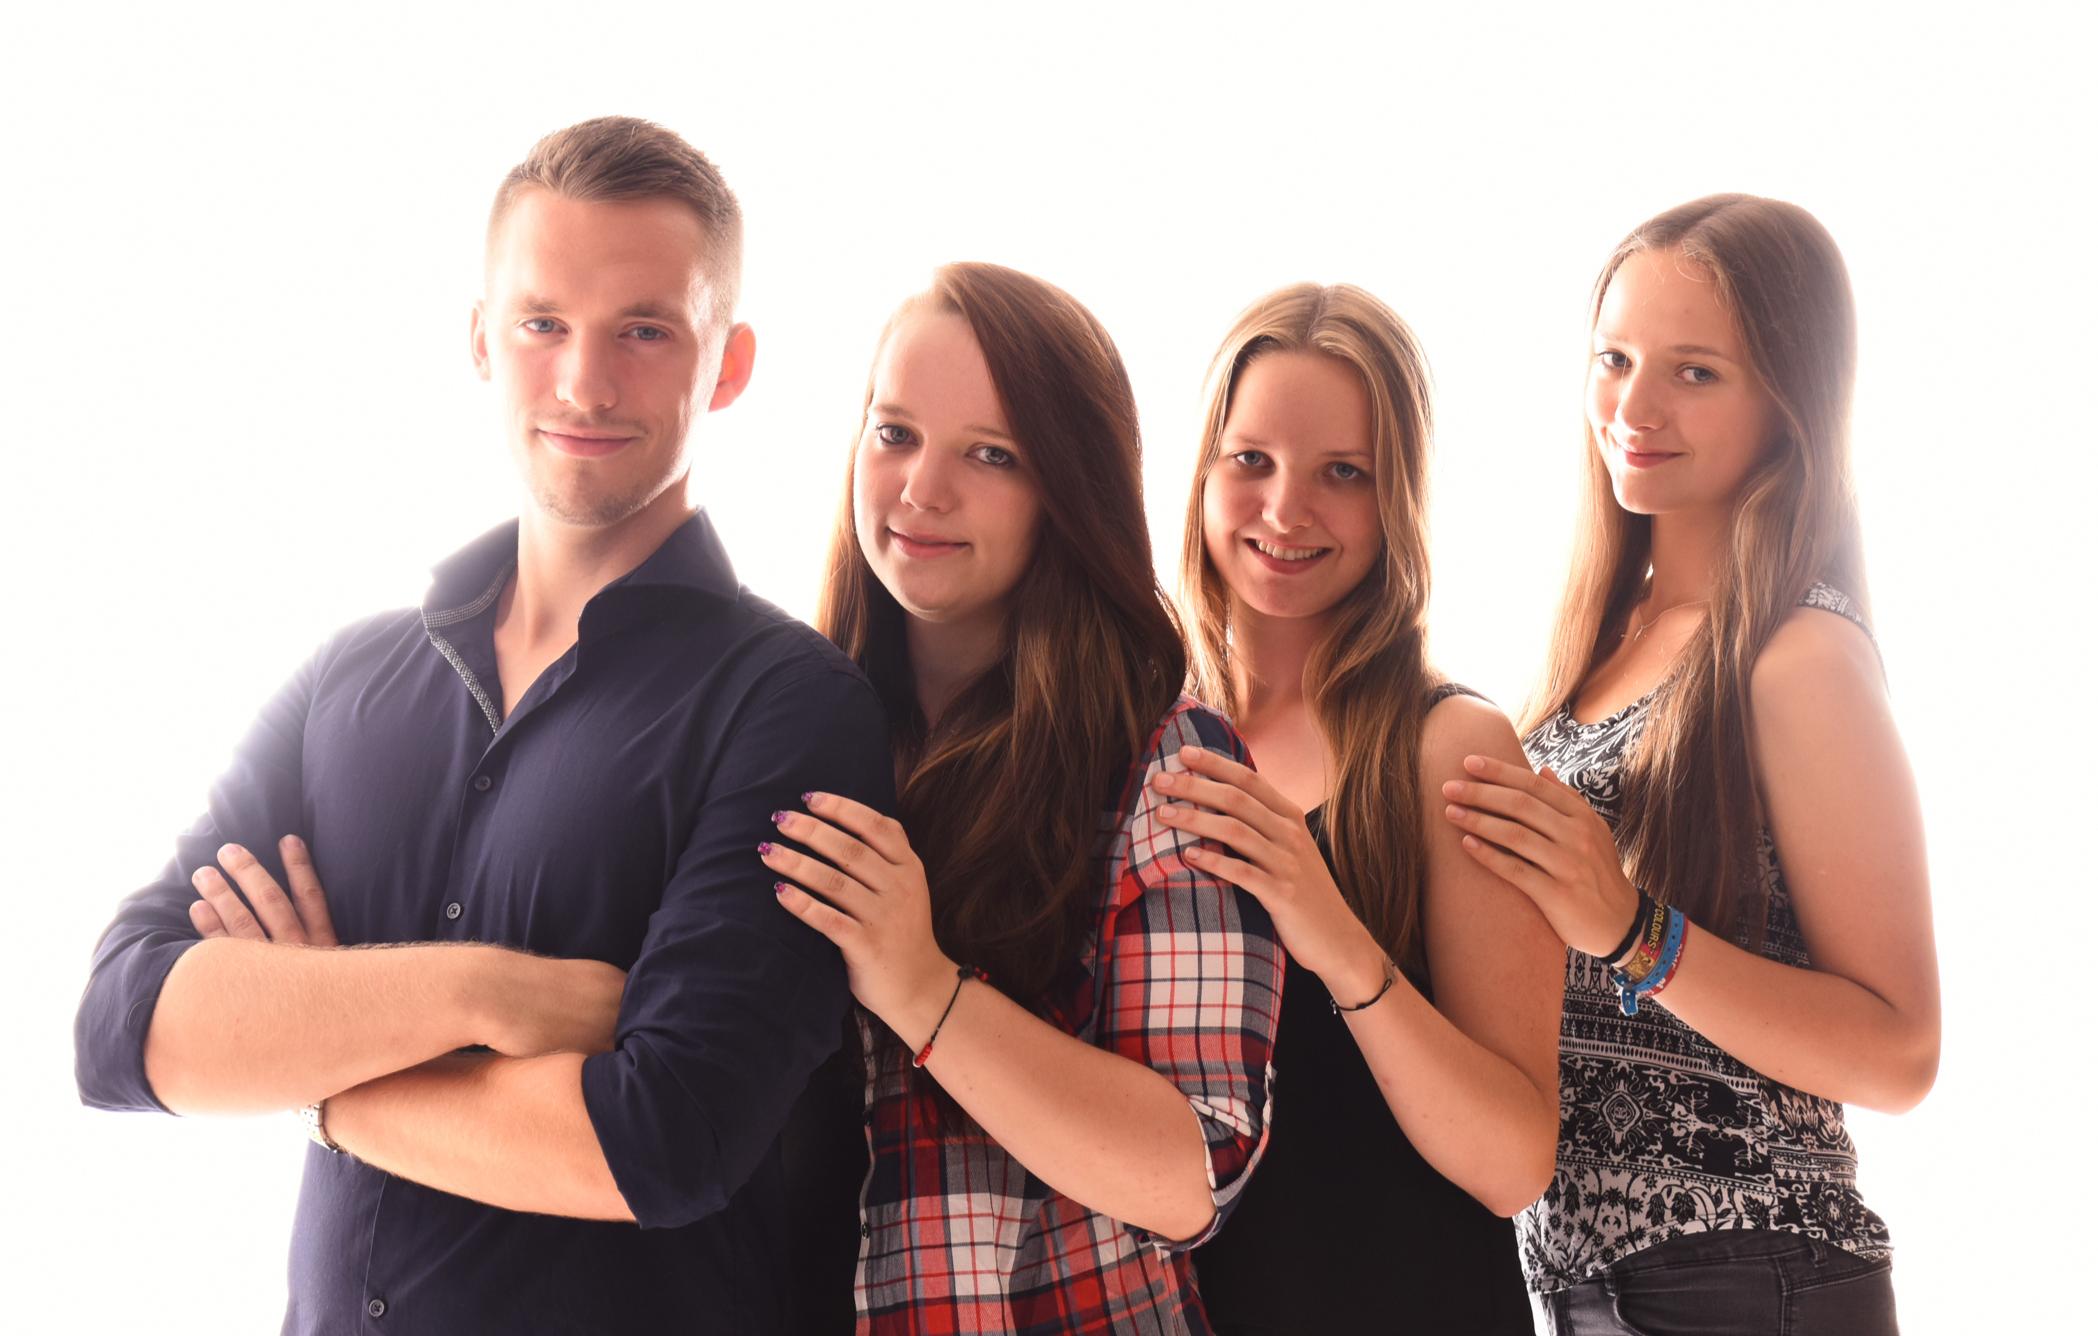 familien-fotoshooting-bremerhaven-bg1